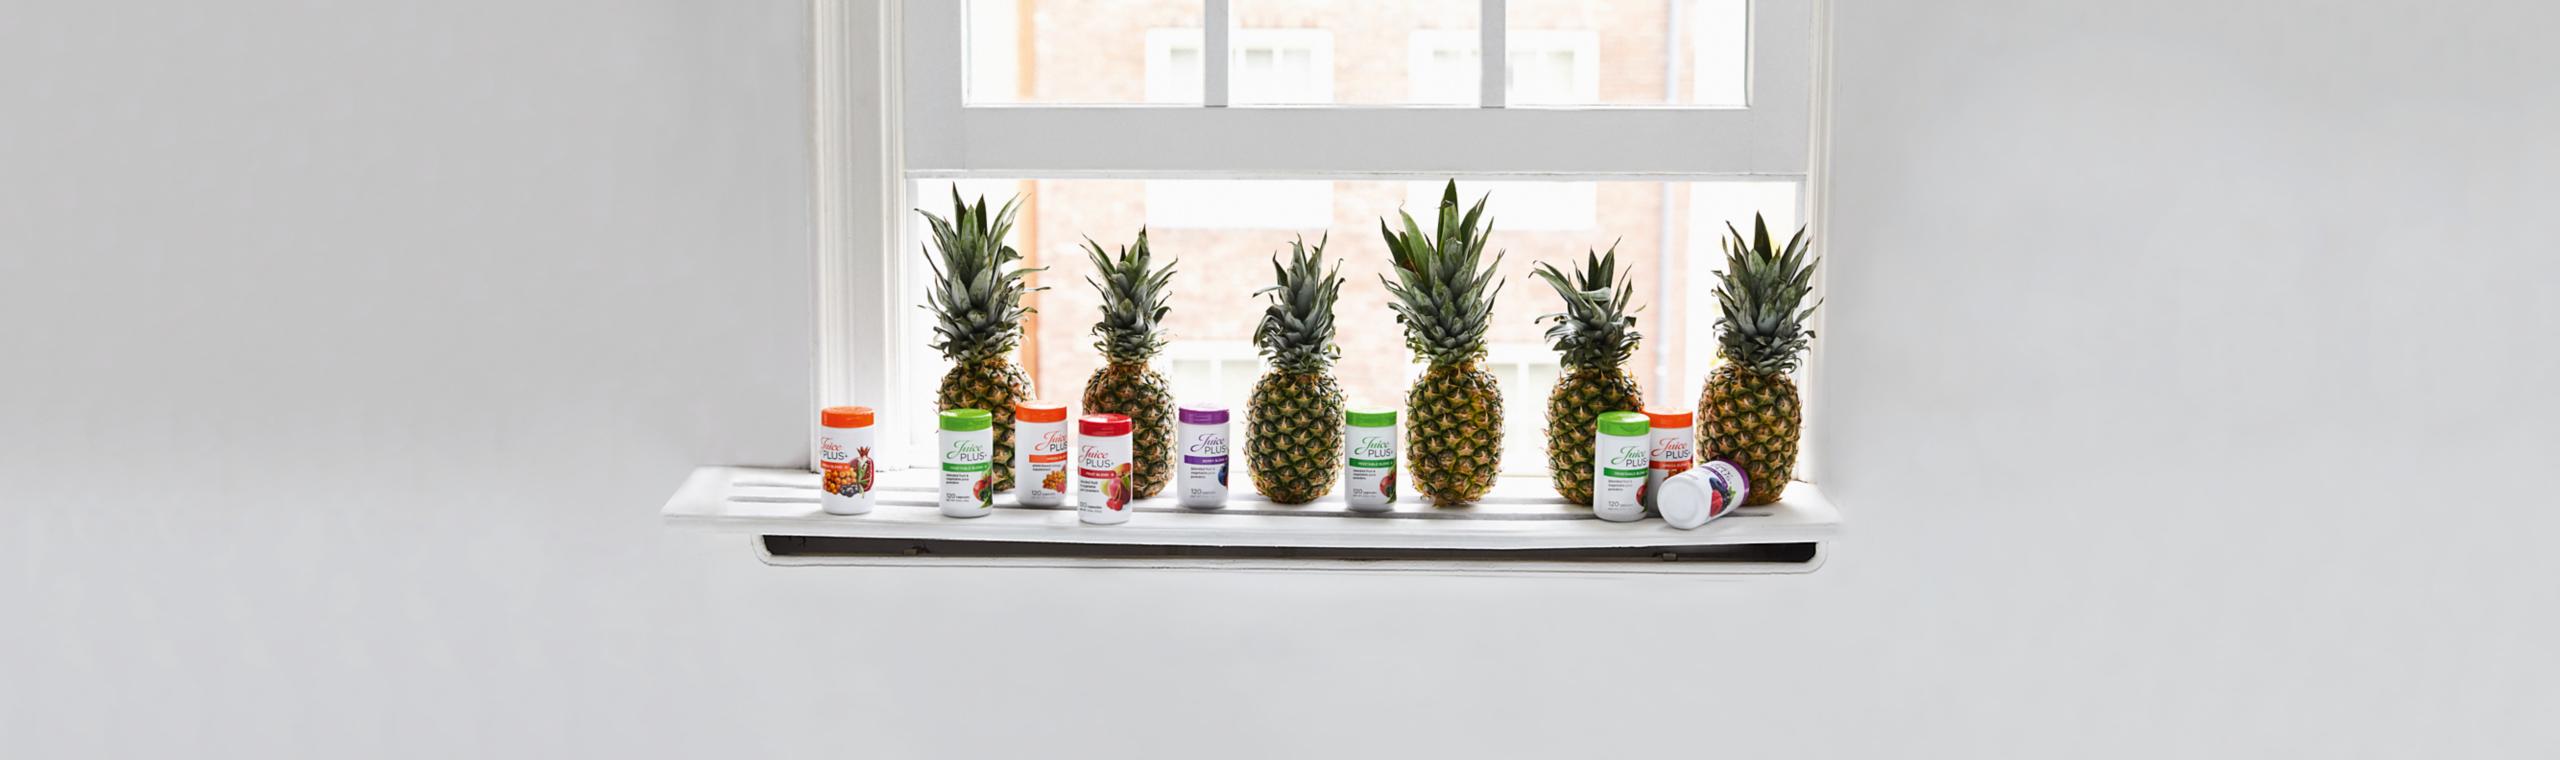 Juice Plus Capsules sitting on window shelf